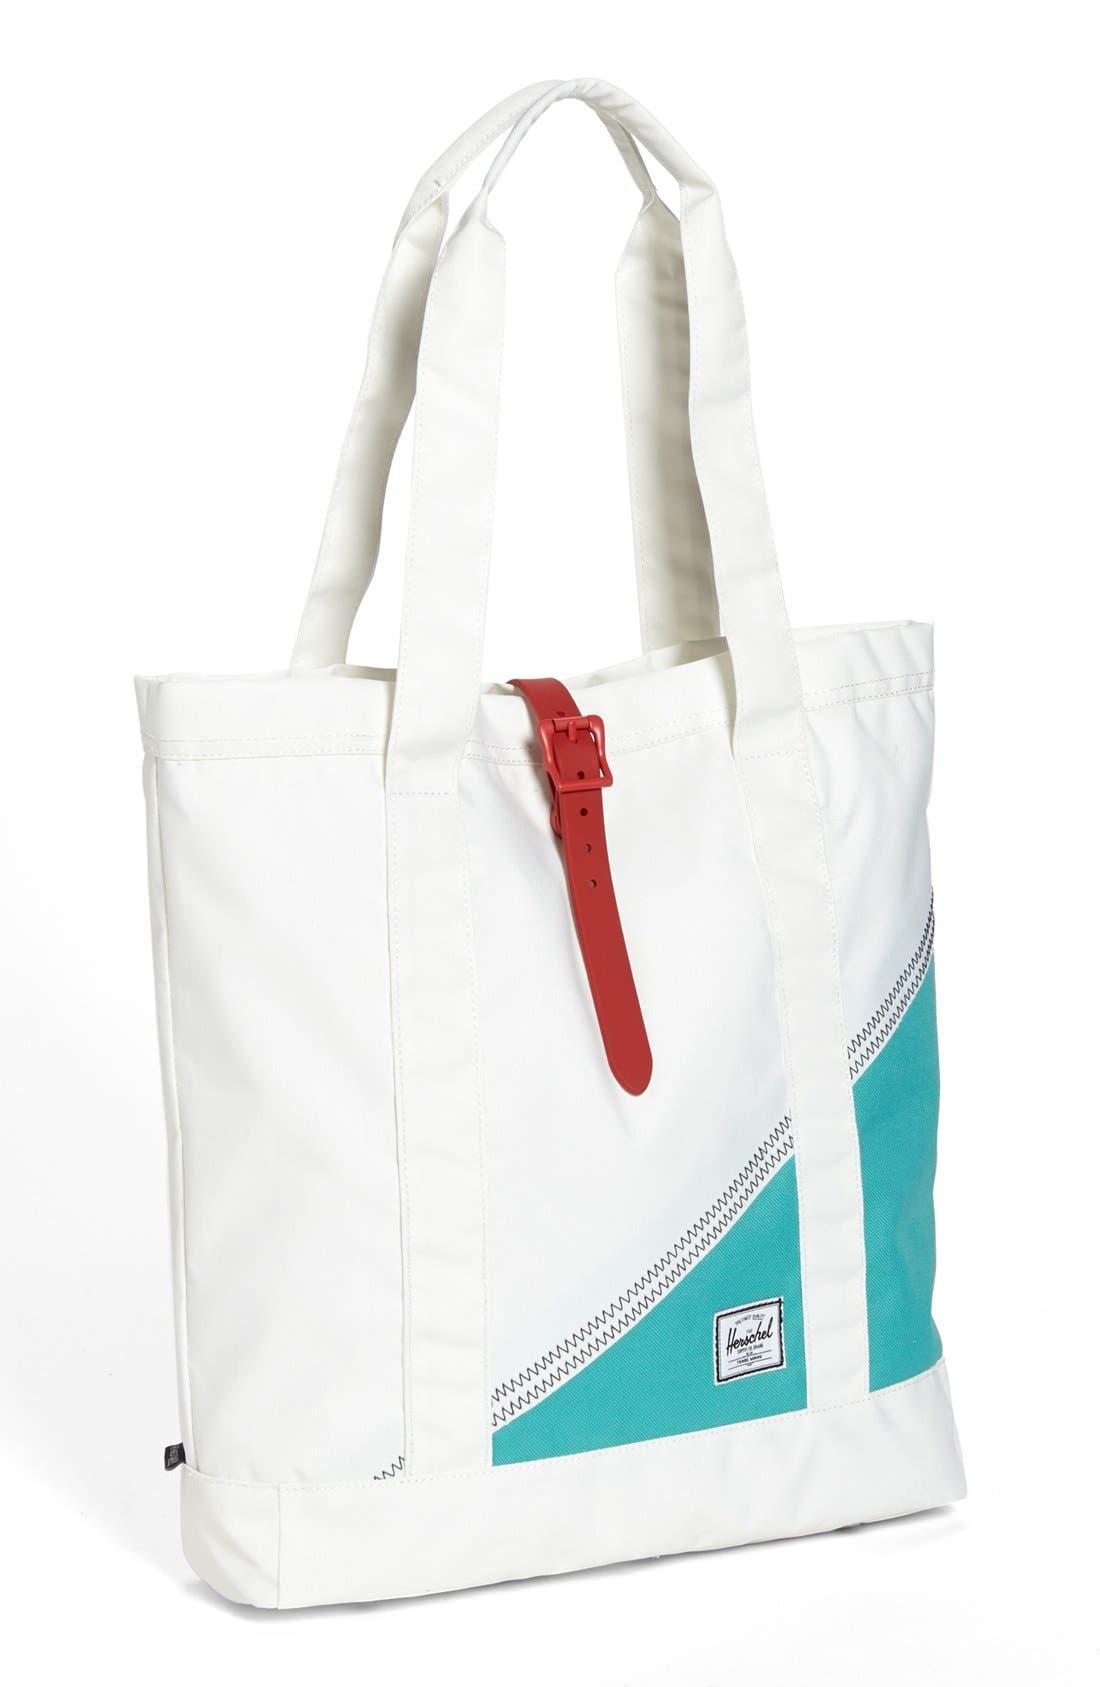 Alternate Image 1 Selected - Herschel Supply Co. 'Market - Studio Collection' Tote Bag